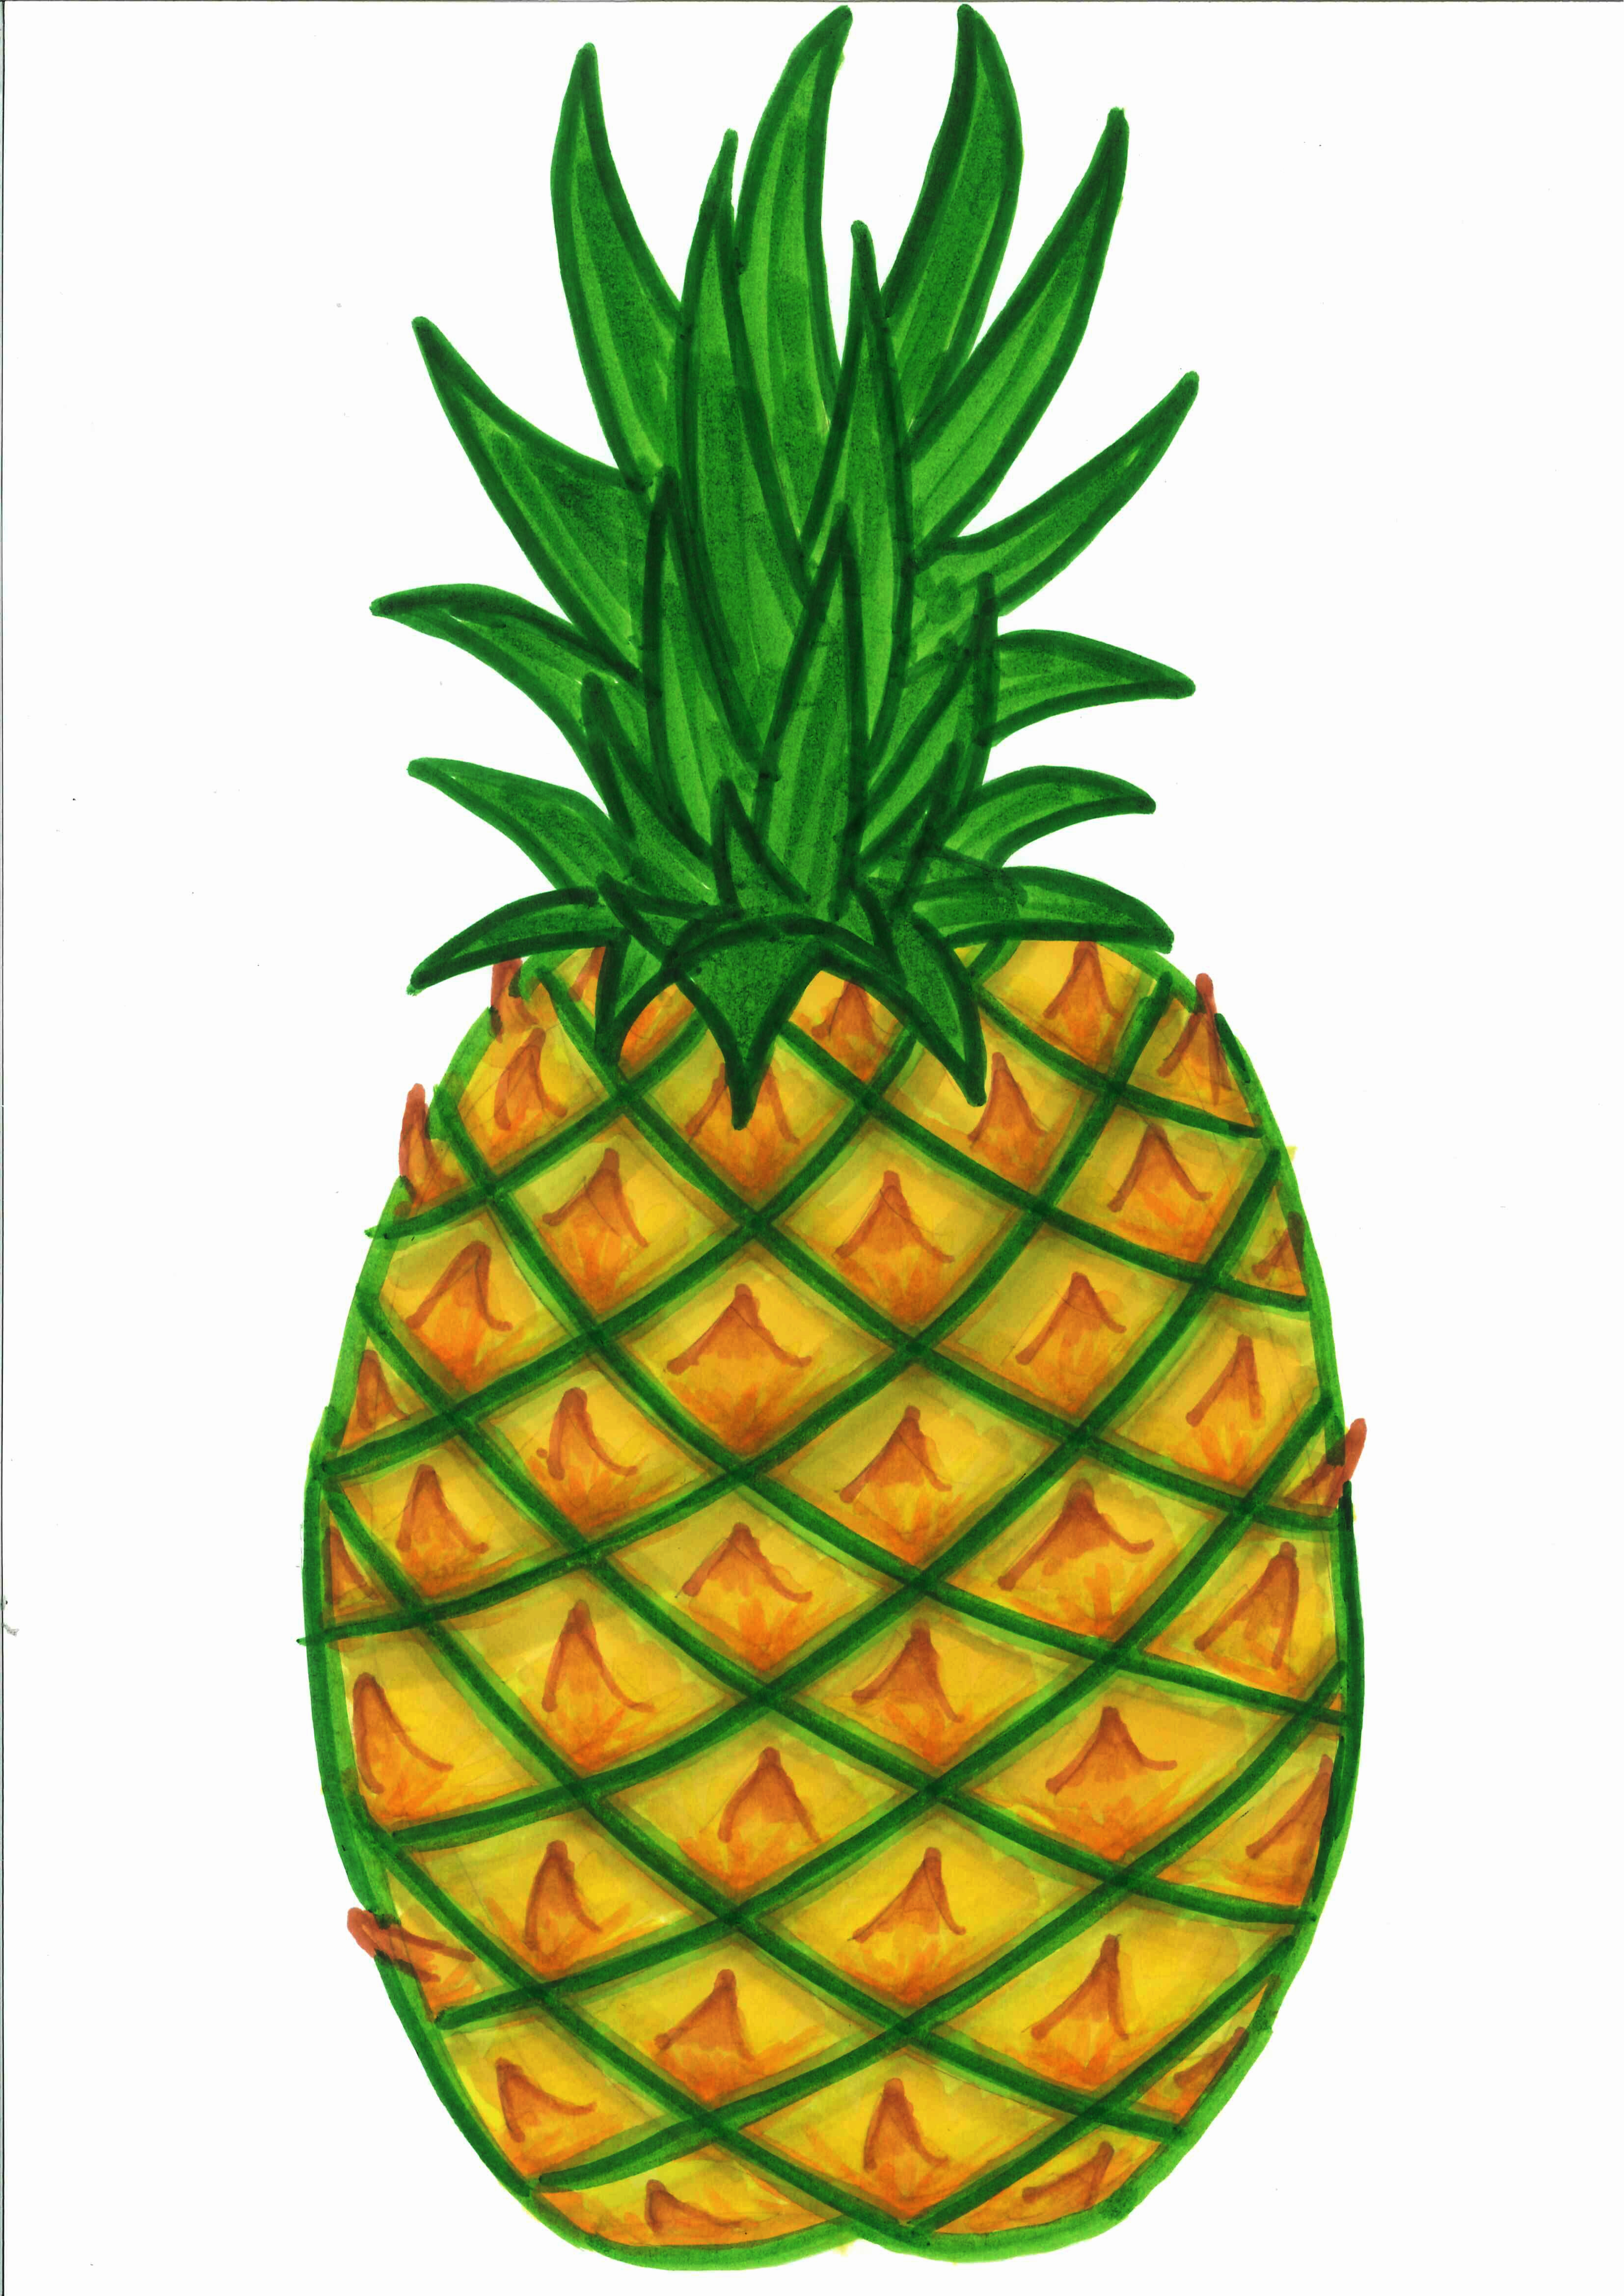 Plant clipart pine apple Clipart Clipart White pineapple%20clipart%20black%20and%20white Black